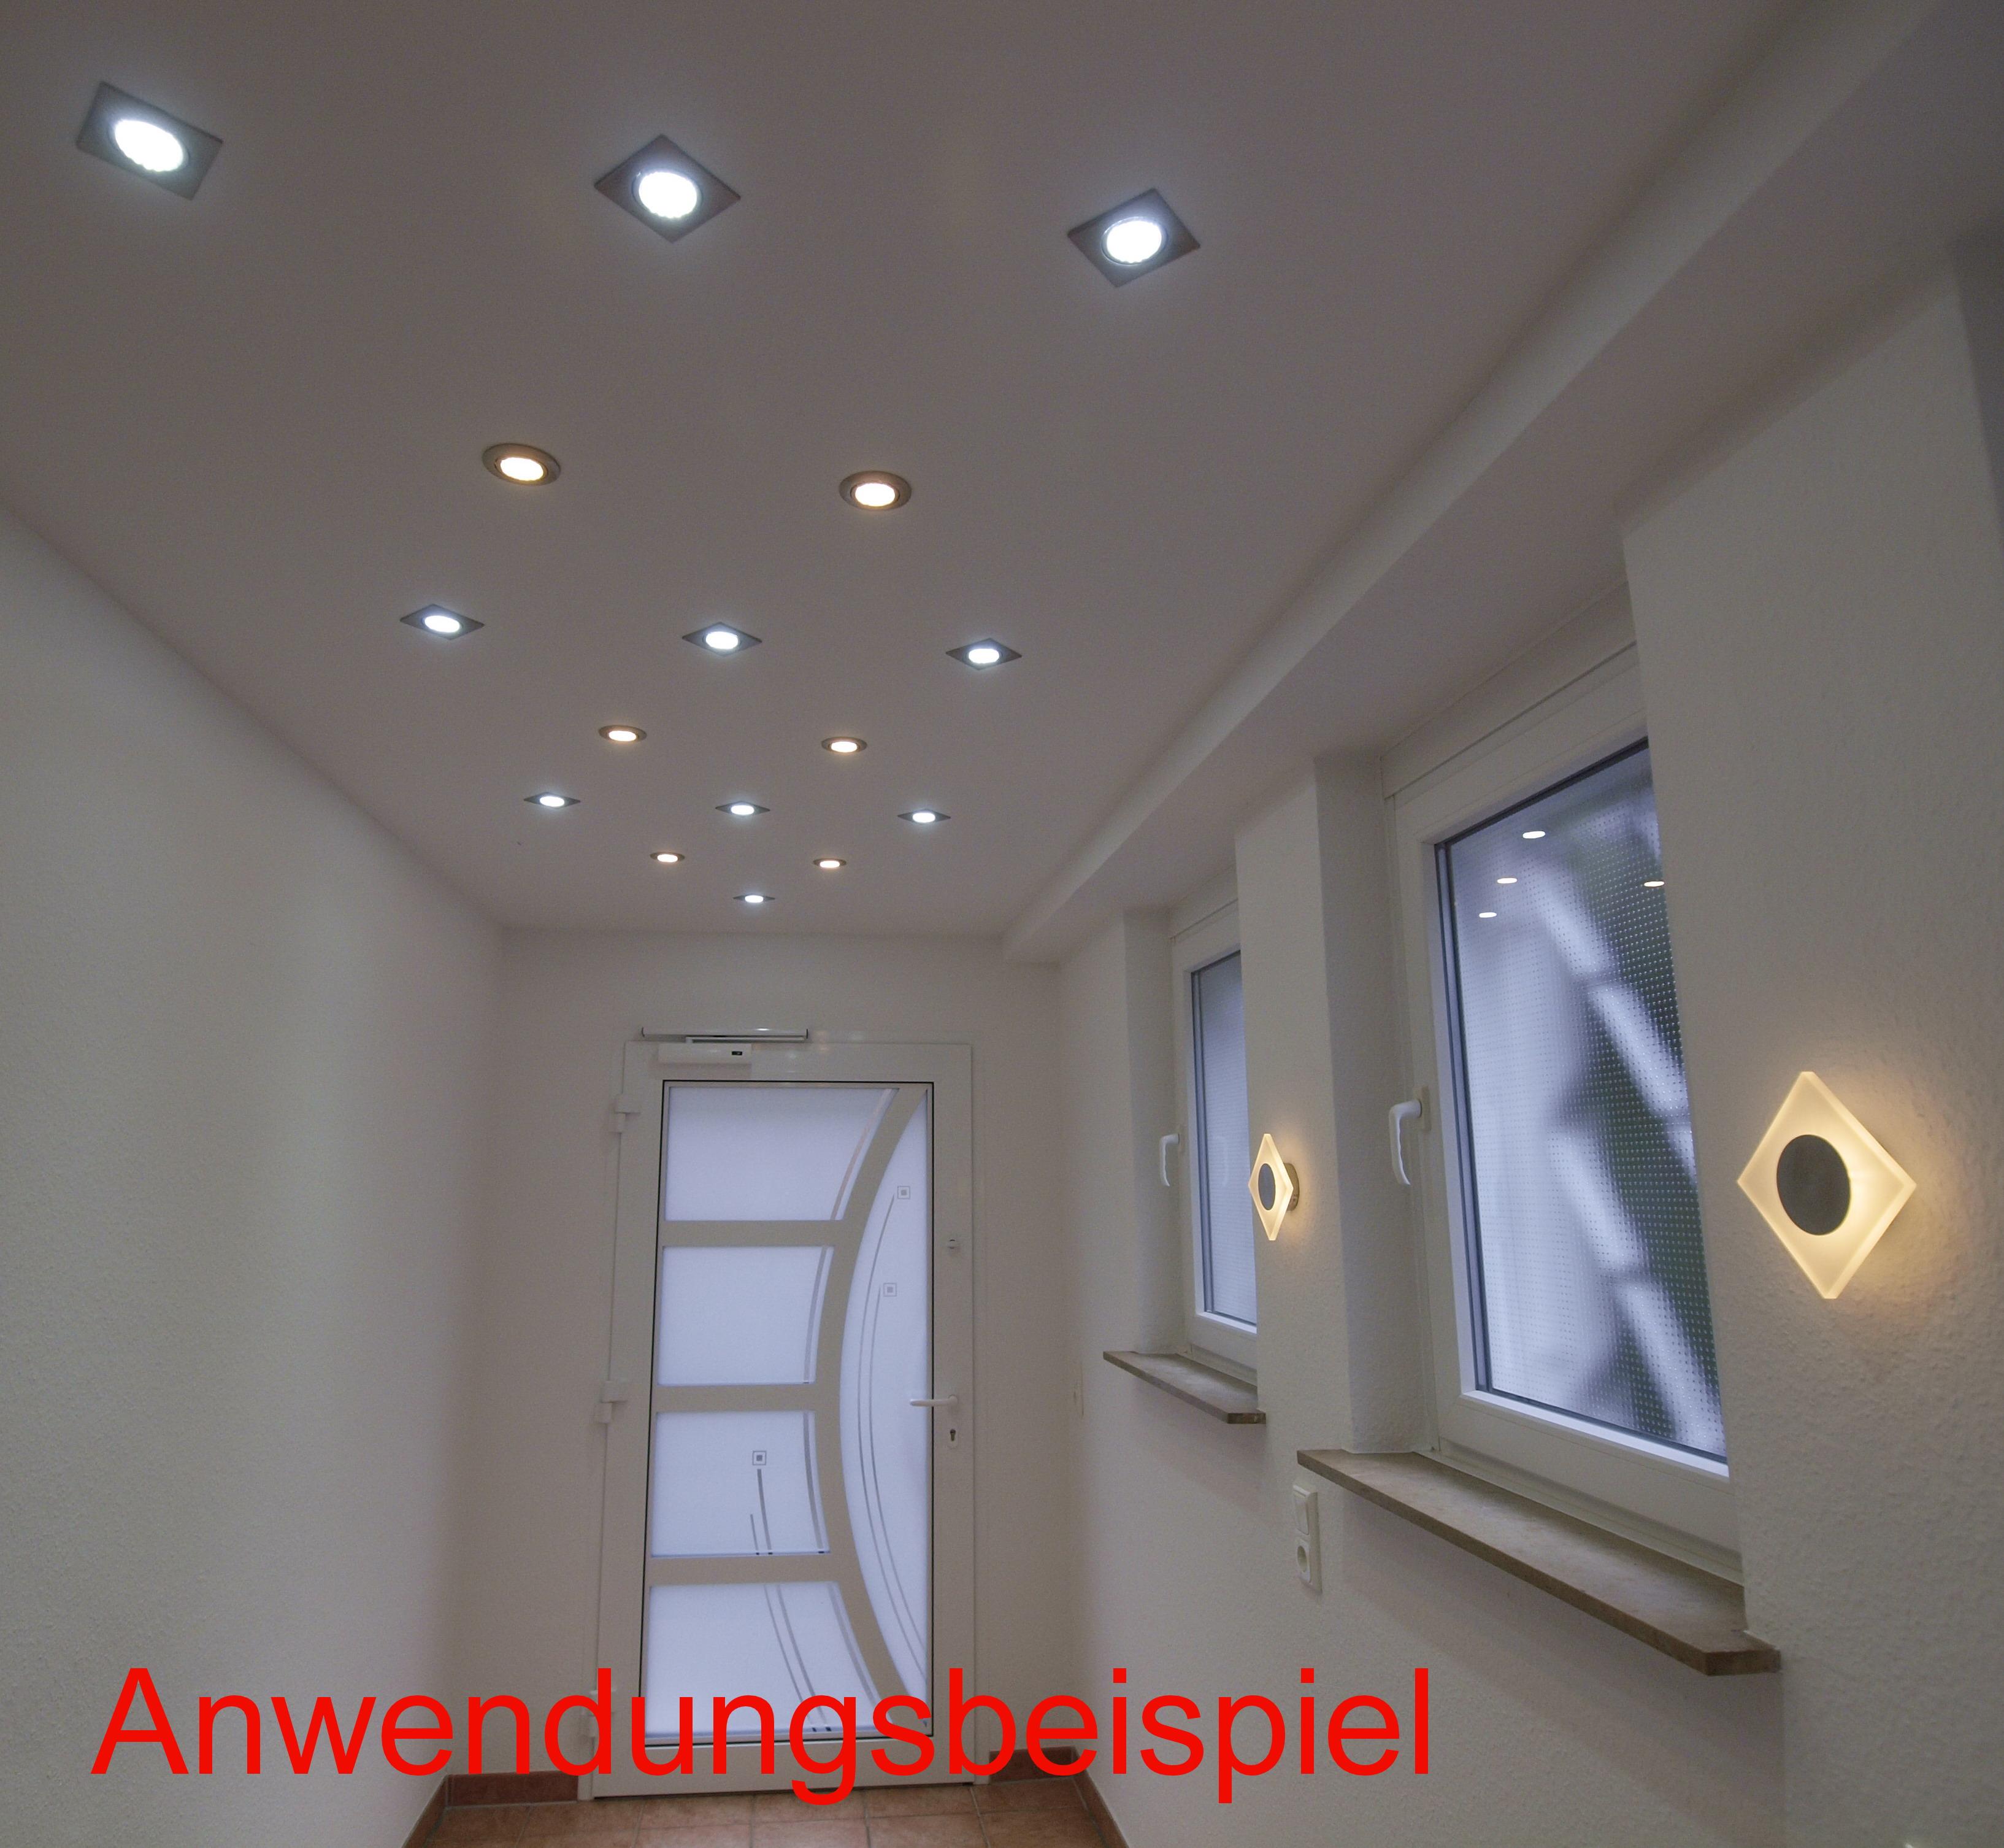 led steckernetzger t 3 12v regelbar universal netzger t 6 fach verstellbar kamilux gmbh. Black Bedroom Furniture Sets. Home Design Ideas